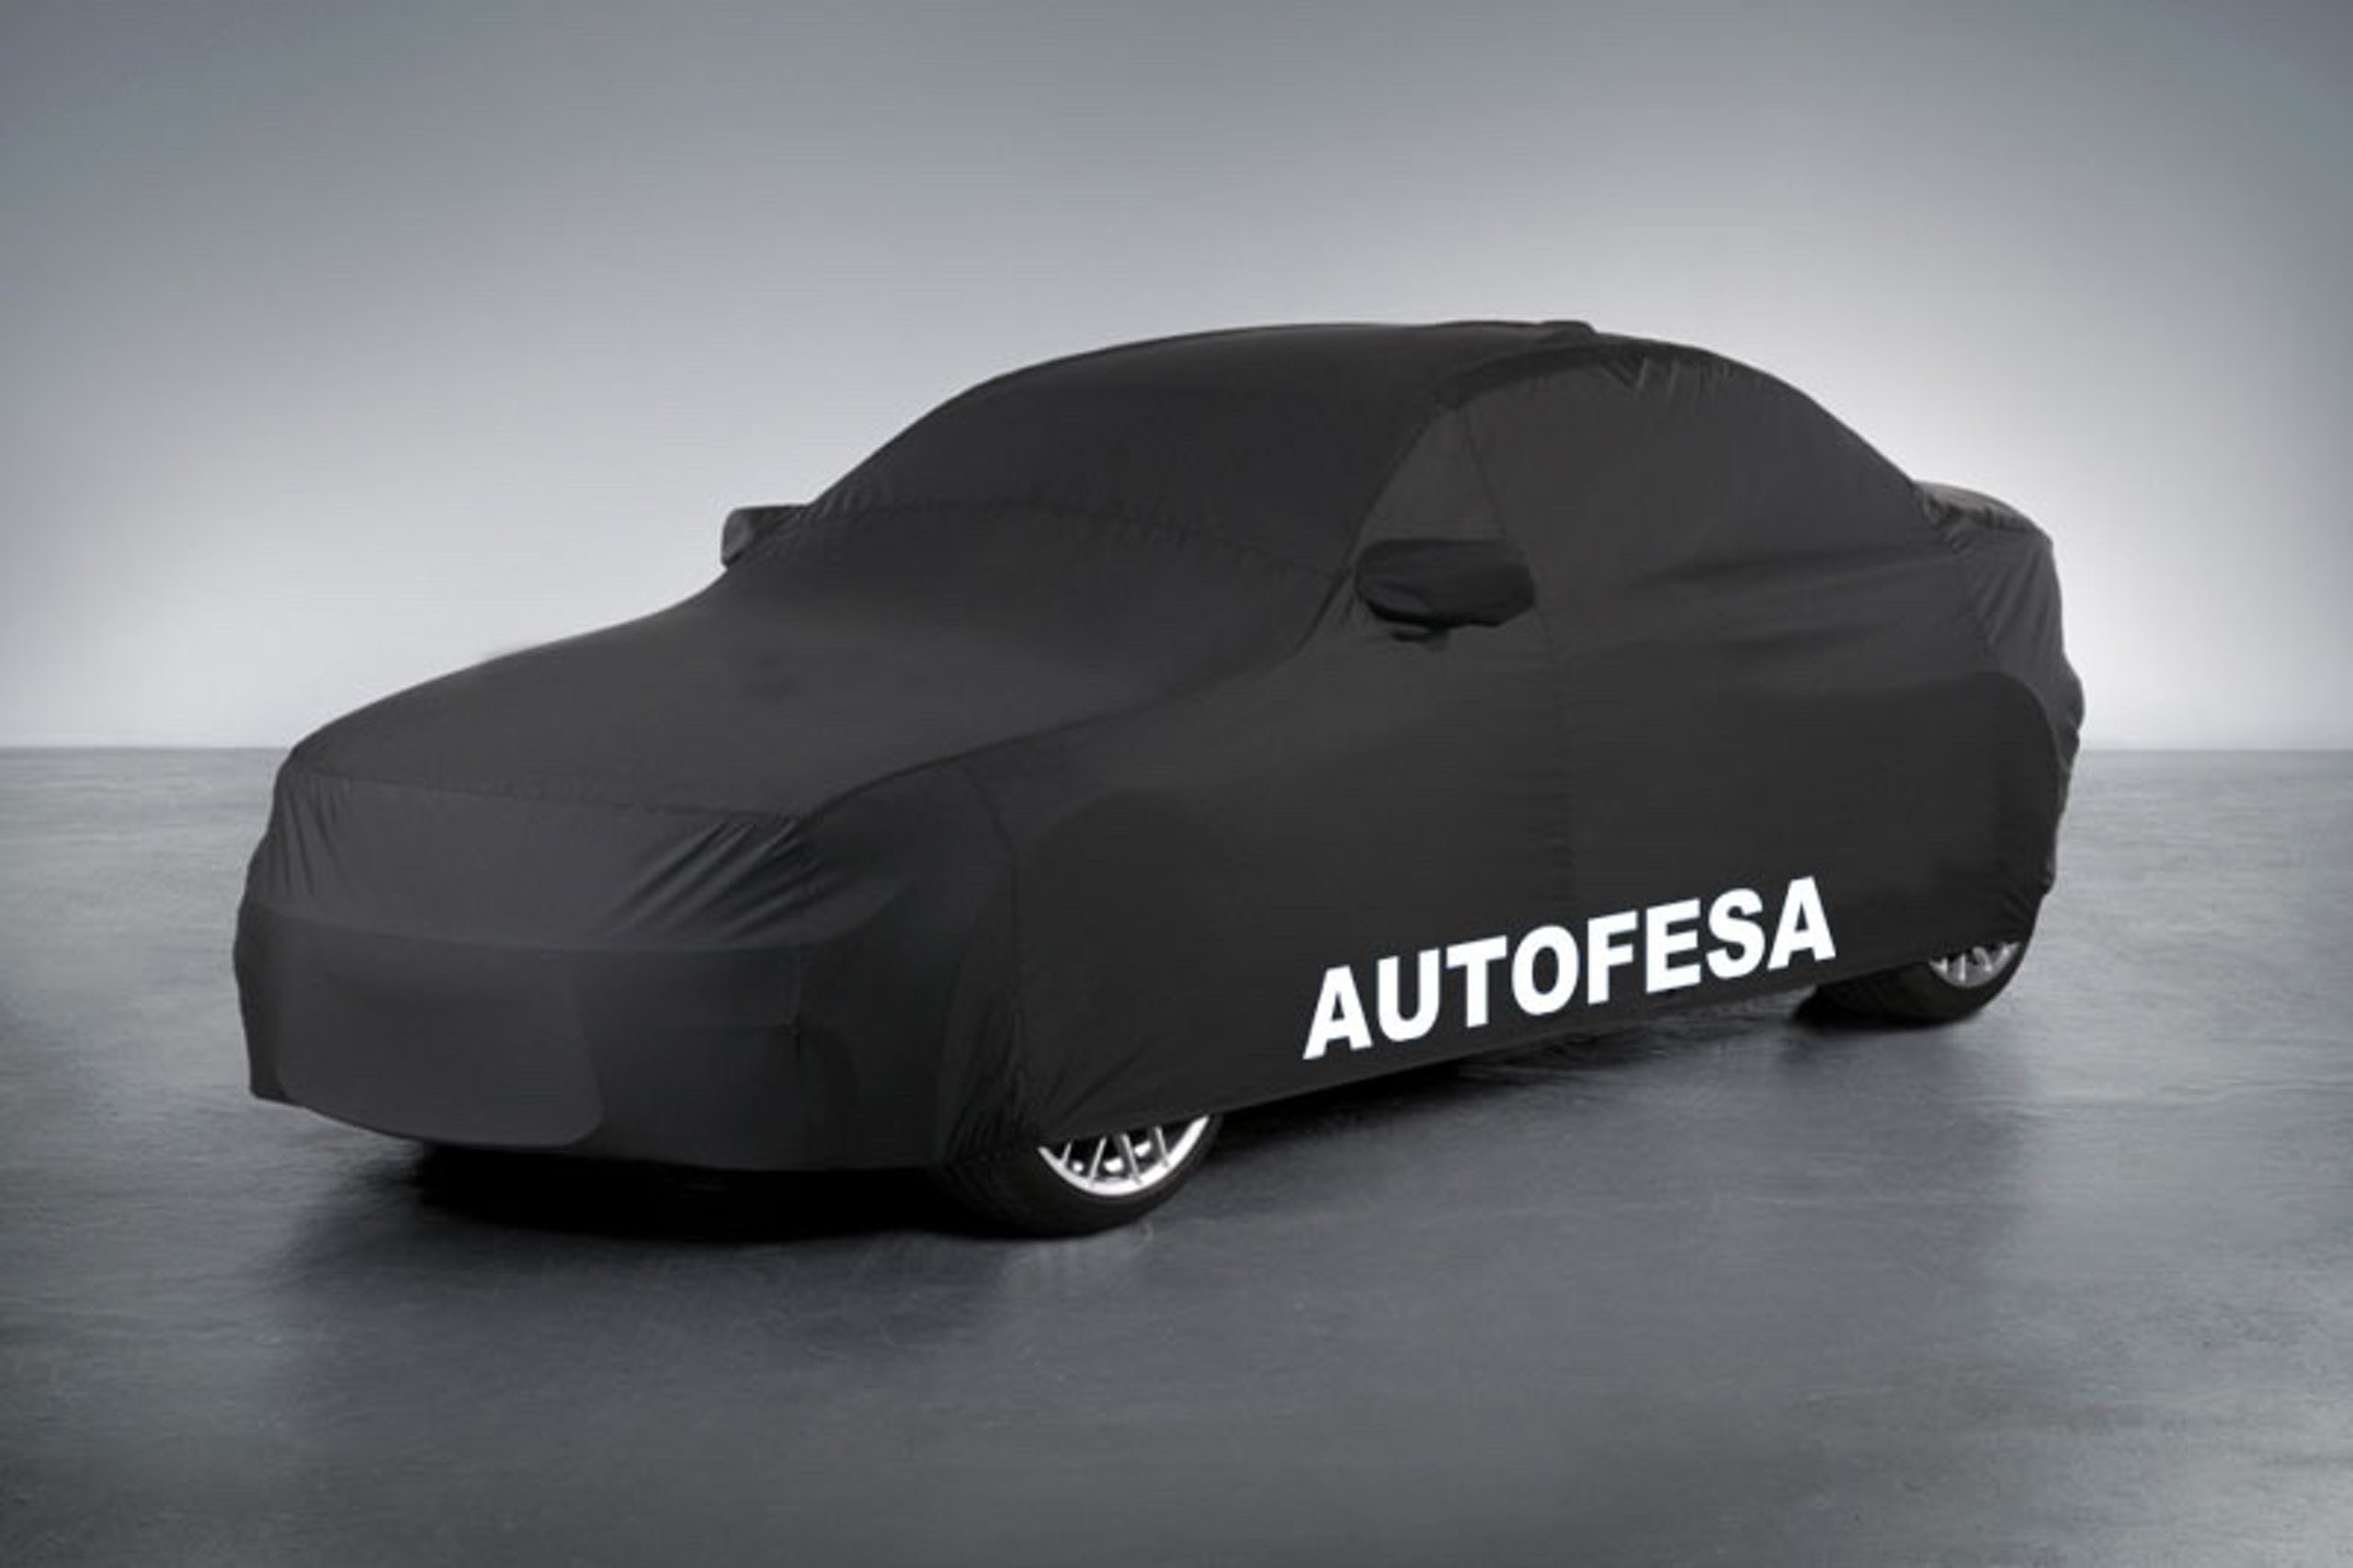 Audi A4 Avant 1.8 TFSi 150cv 5p S/S - Foto 2